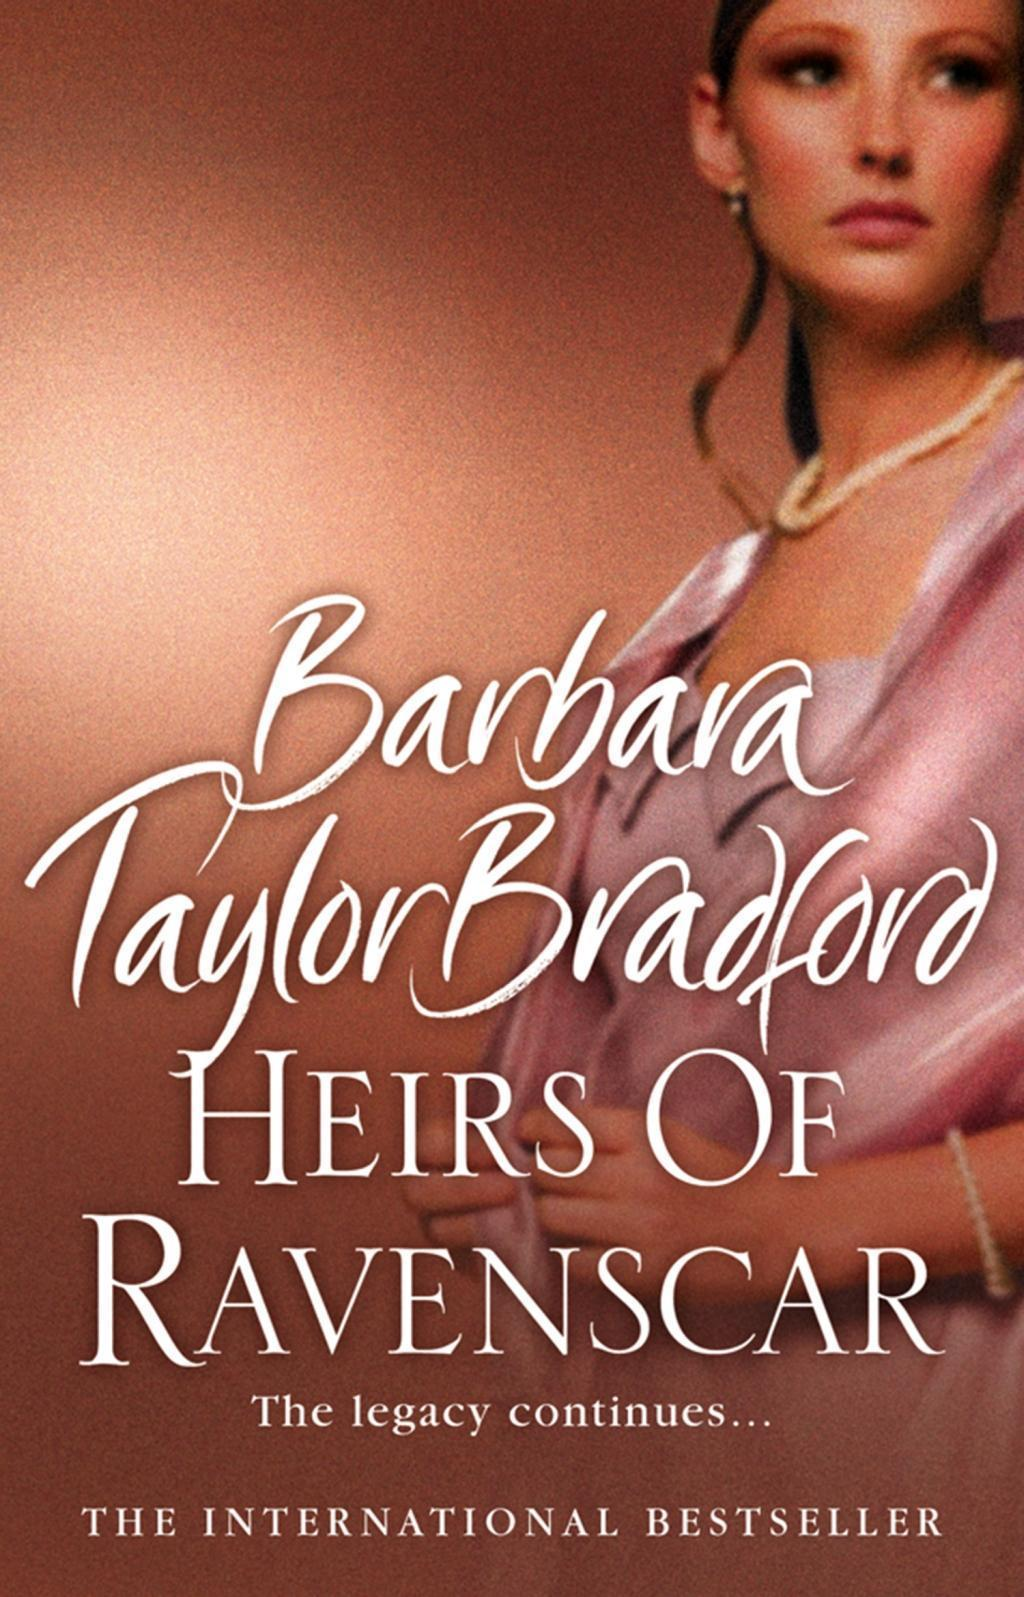 Heirs of Ravenscar